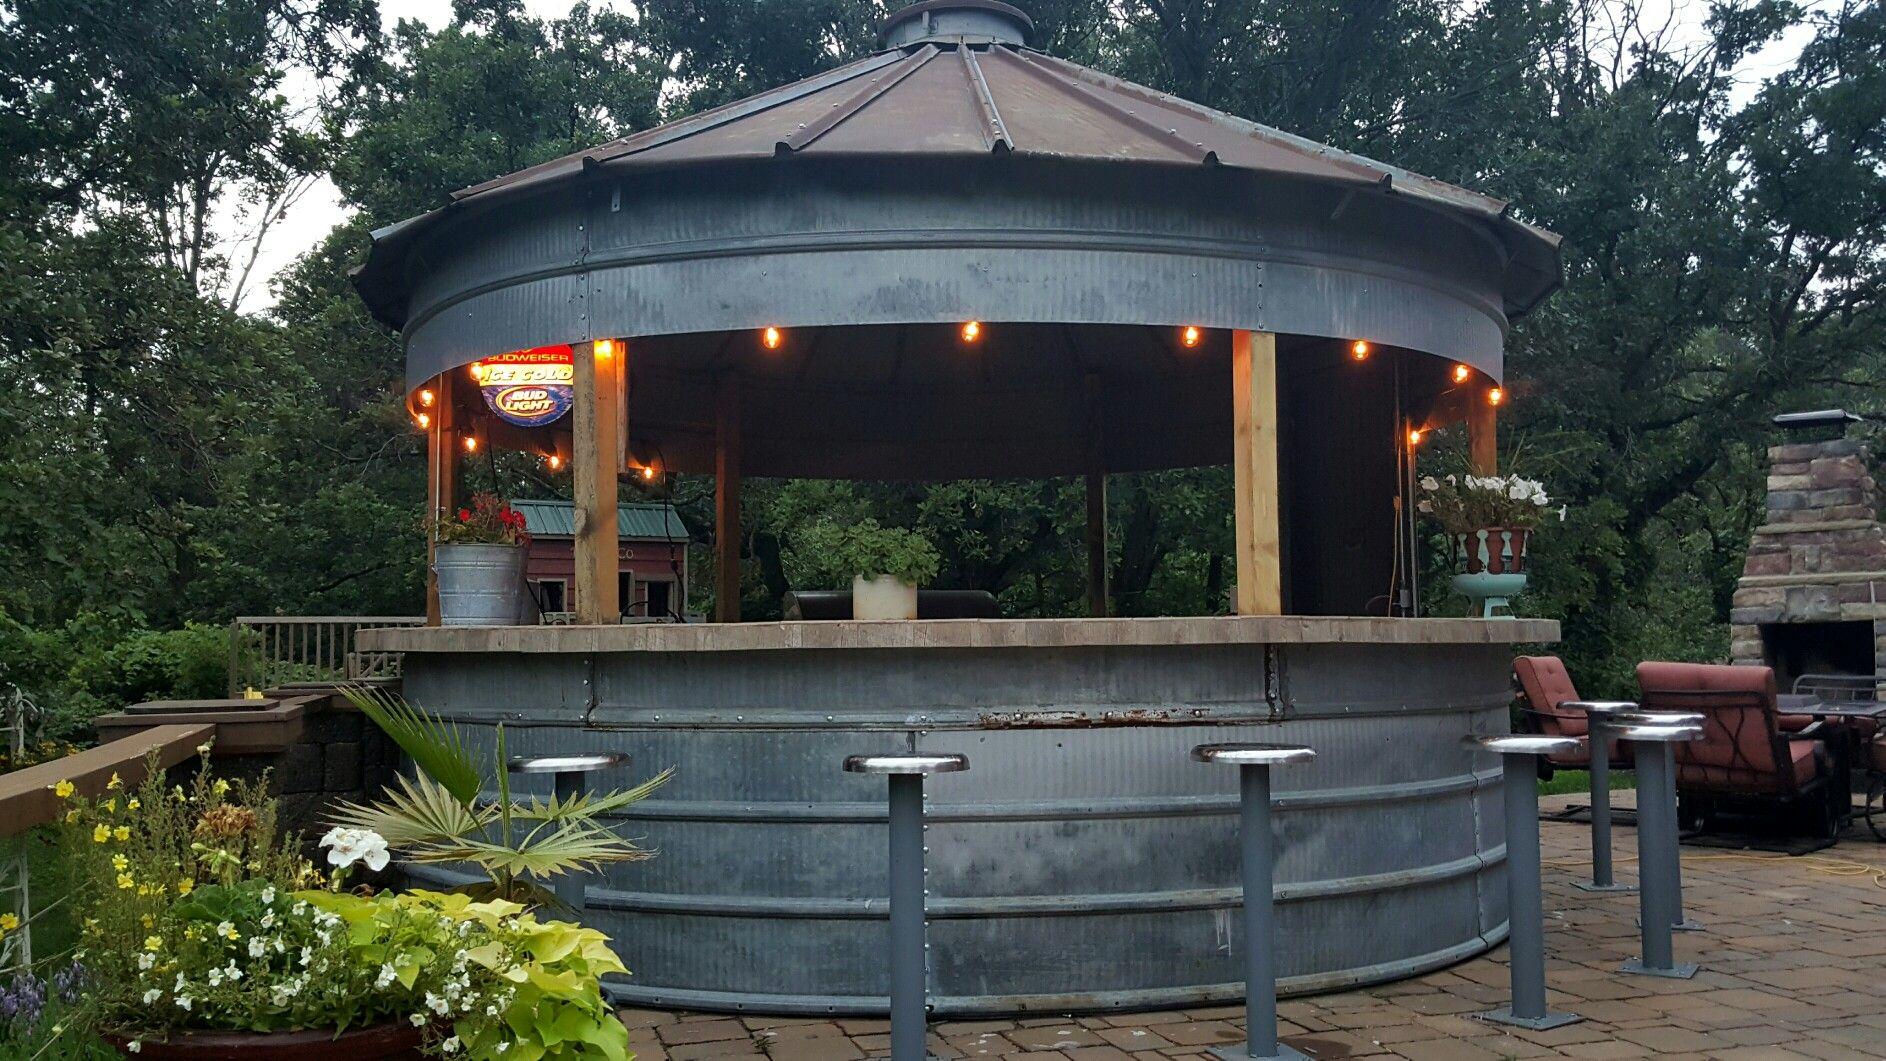 Grain bin bar outdoor kitchen a ranch pinterest house backyard and kitchen for How to build a grain bin swimming pool